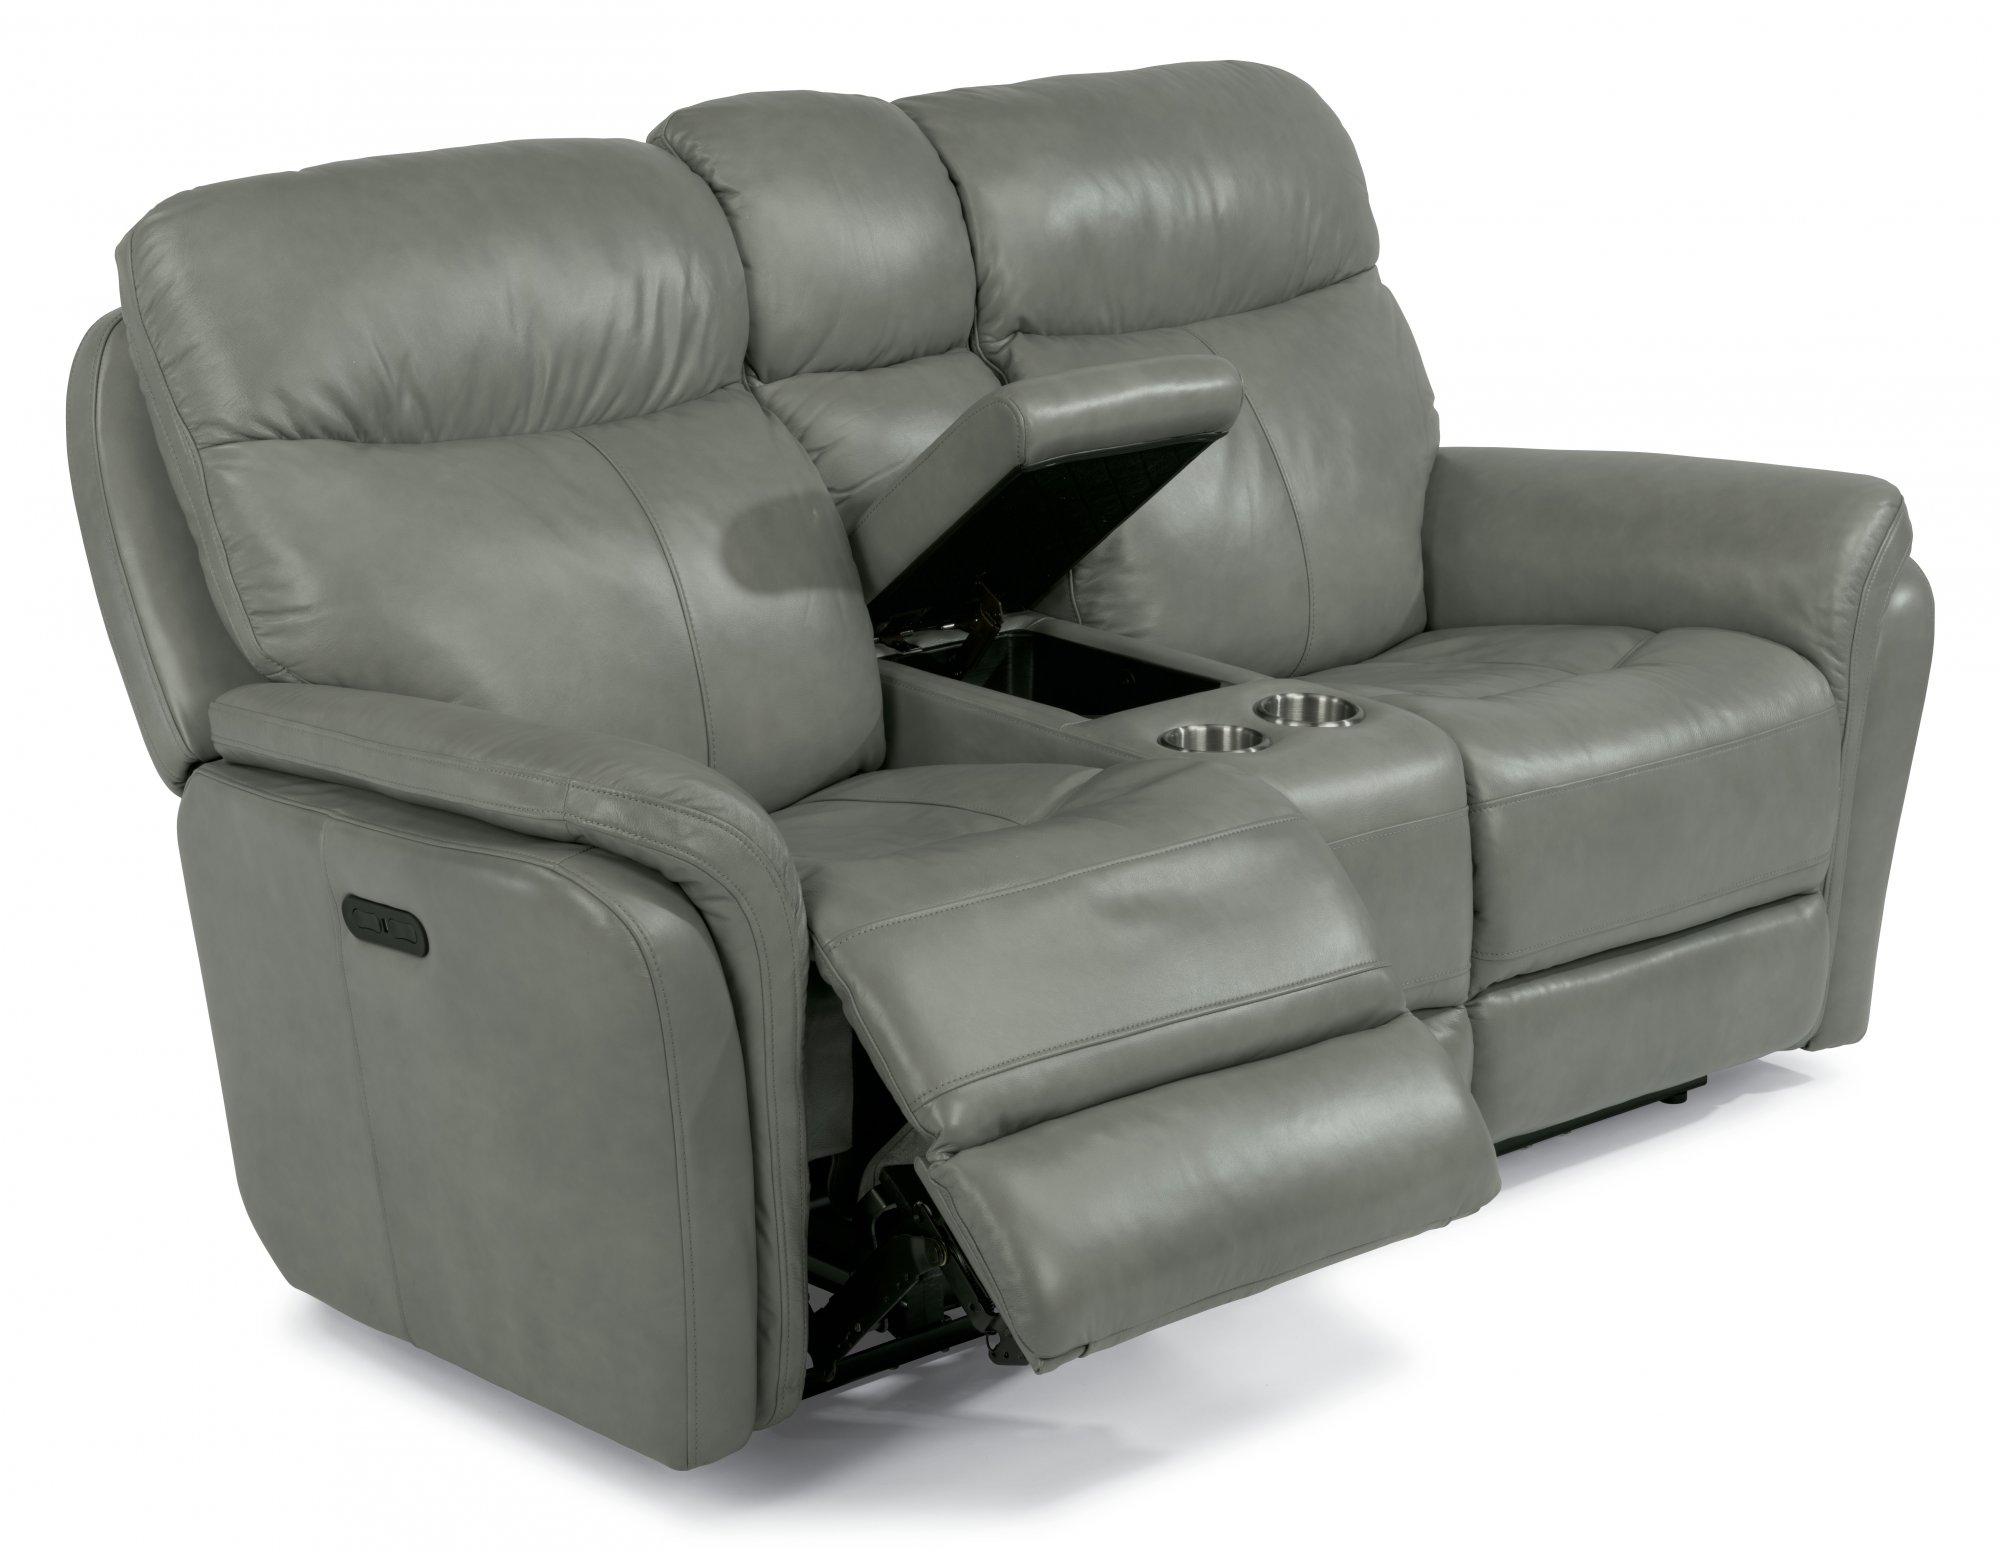 Marvelous Flexsteel 1653 62Ph Zoey Leather Power Reclining Sofa Frankydiablos Diy Chair Ideas Frankydiabloscom